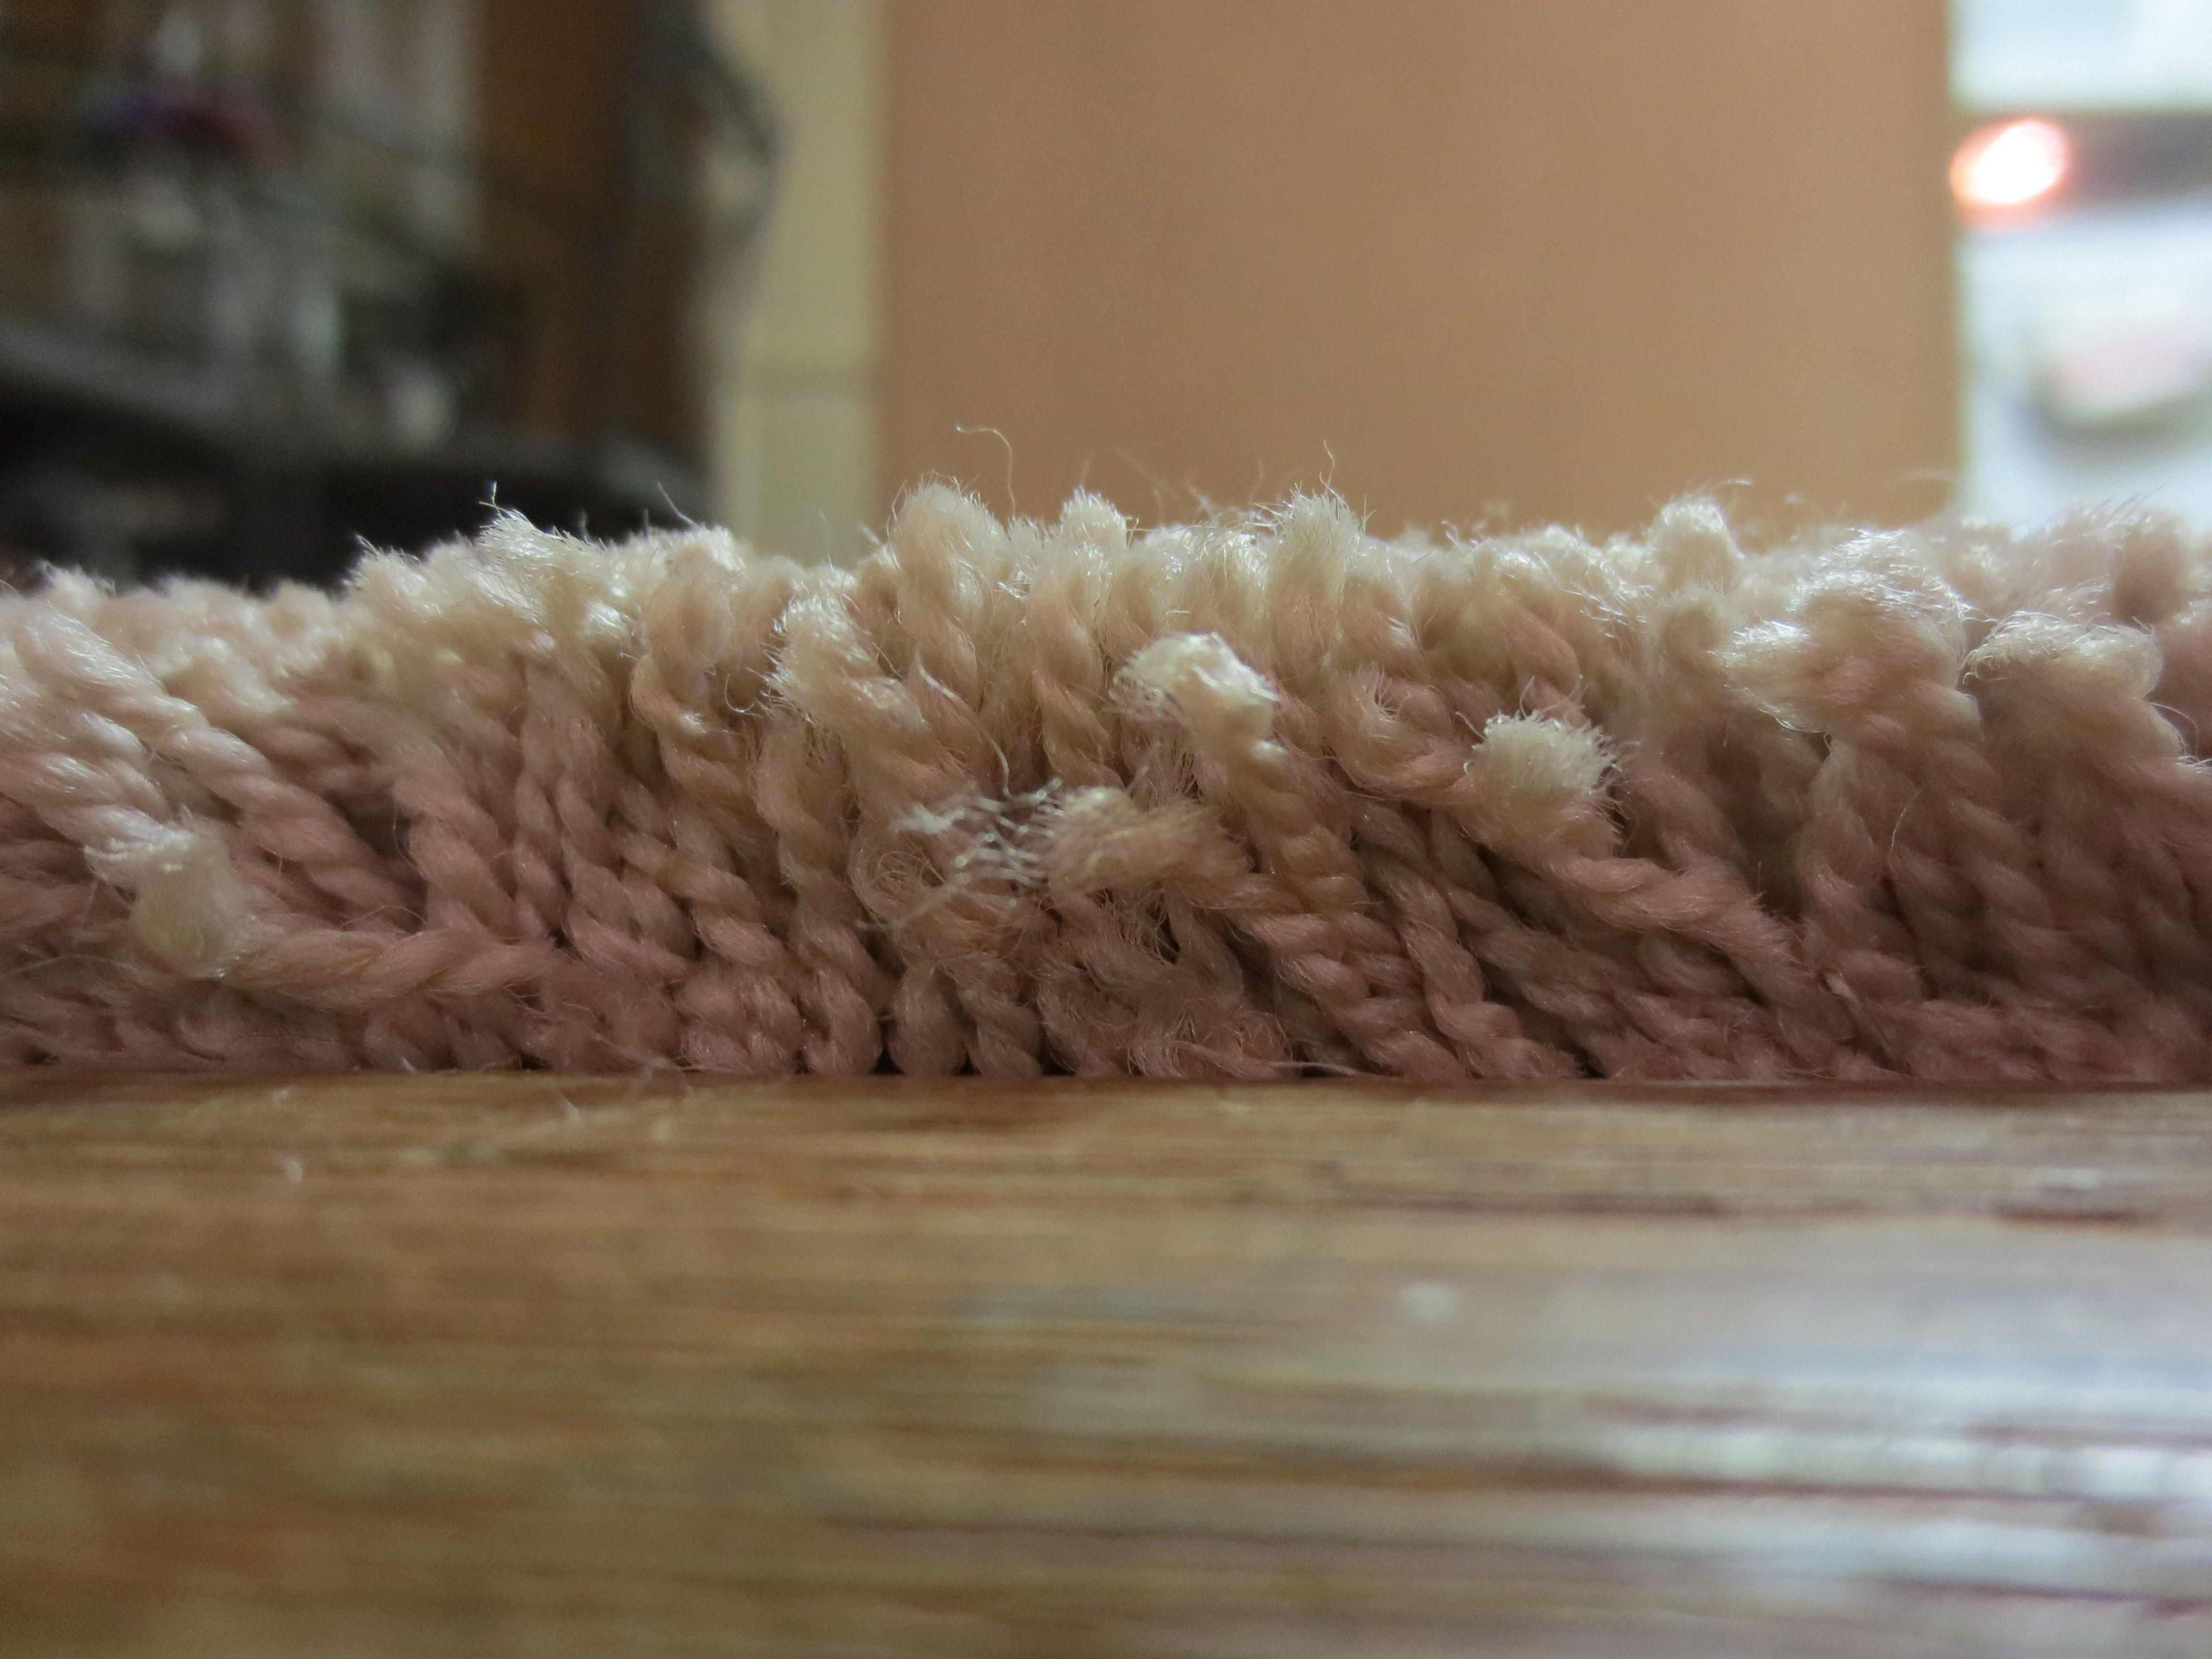 weeks hardwood flooring reviews of bulk continuous filament vs staple fiber carpeting pertaining to carpet fibers close up 1500 56a8126a3df78cf7729be046 jpg